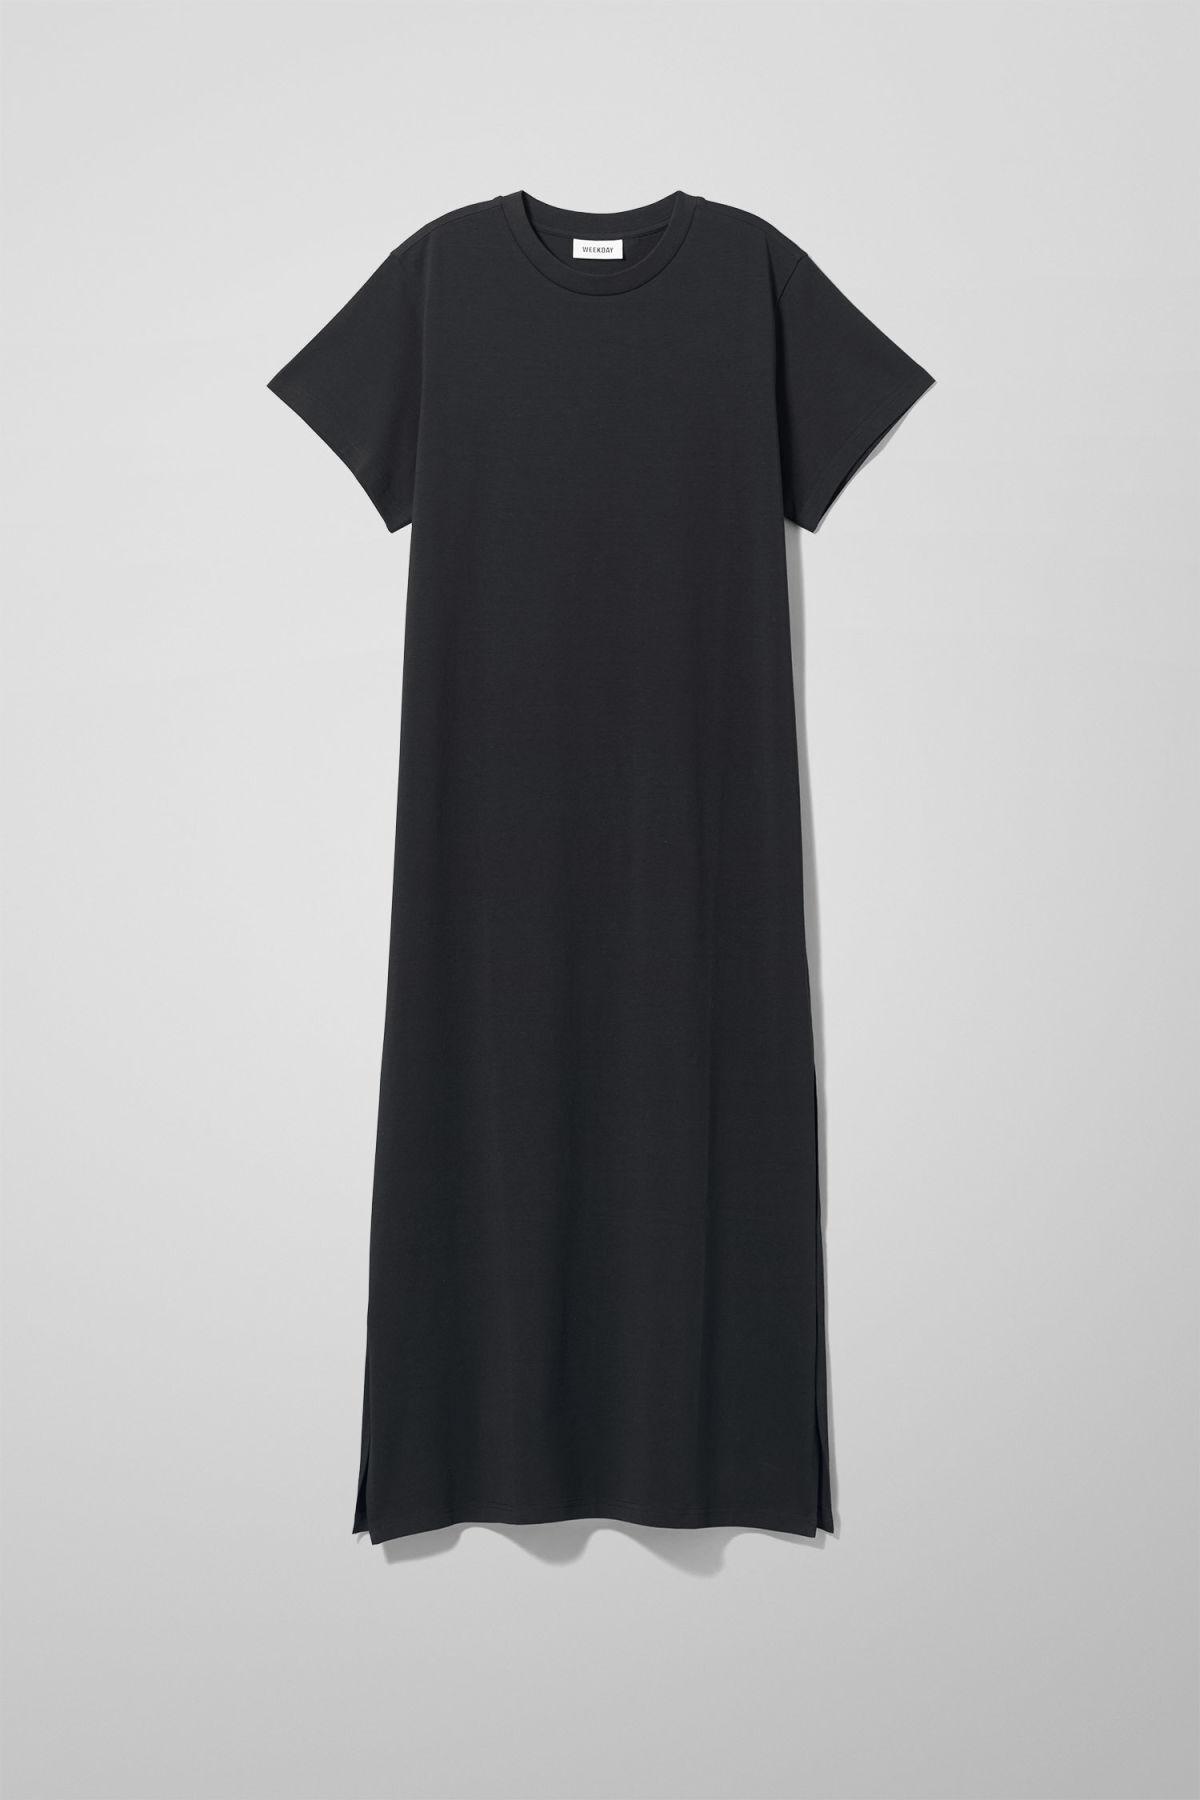 Image of Stroke Dress - Black-M